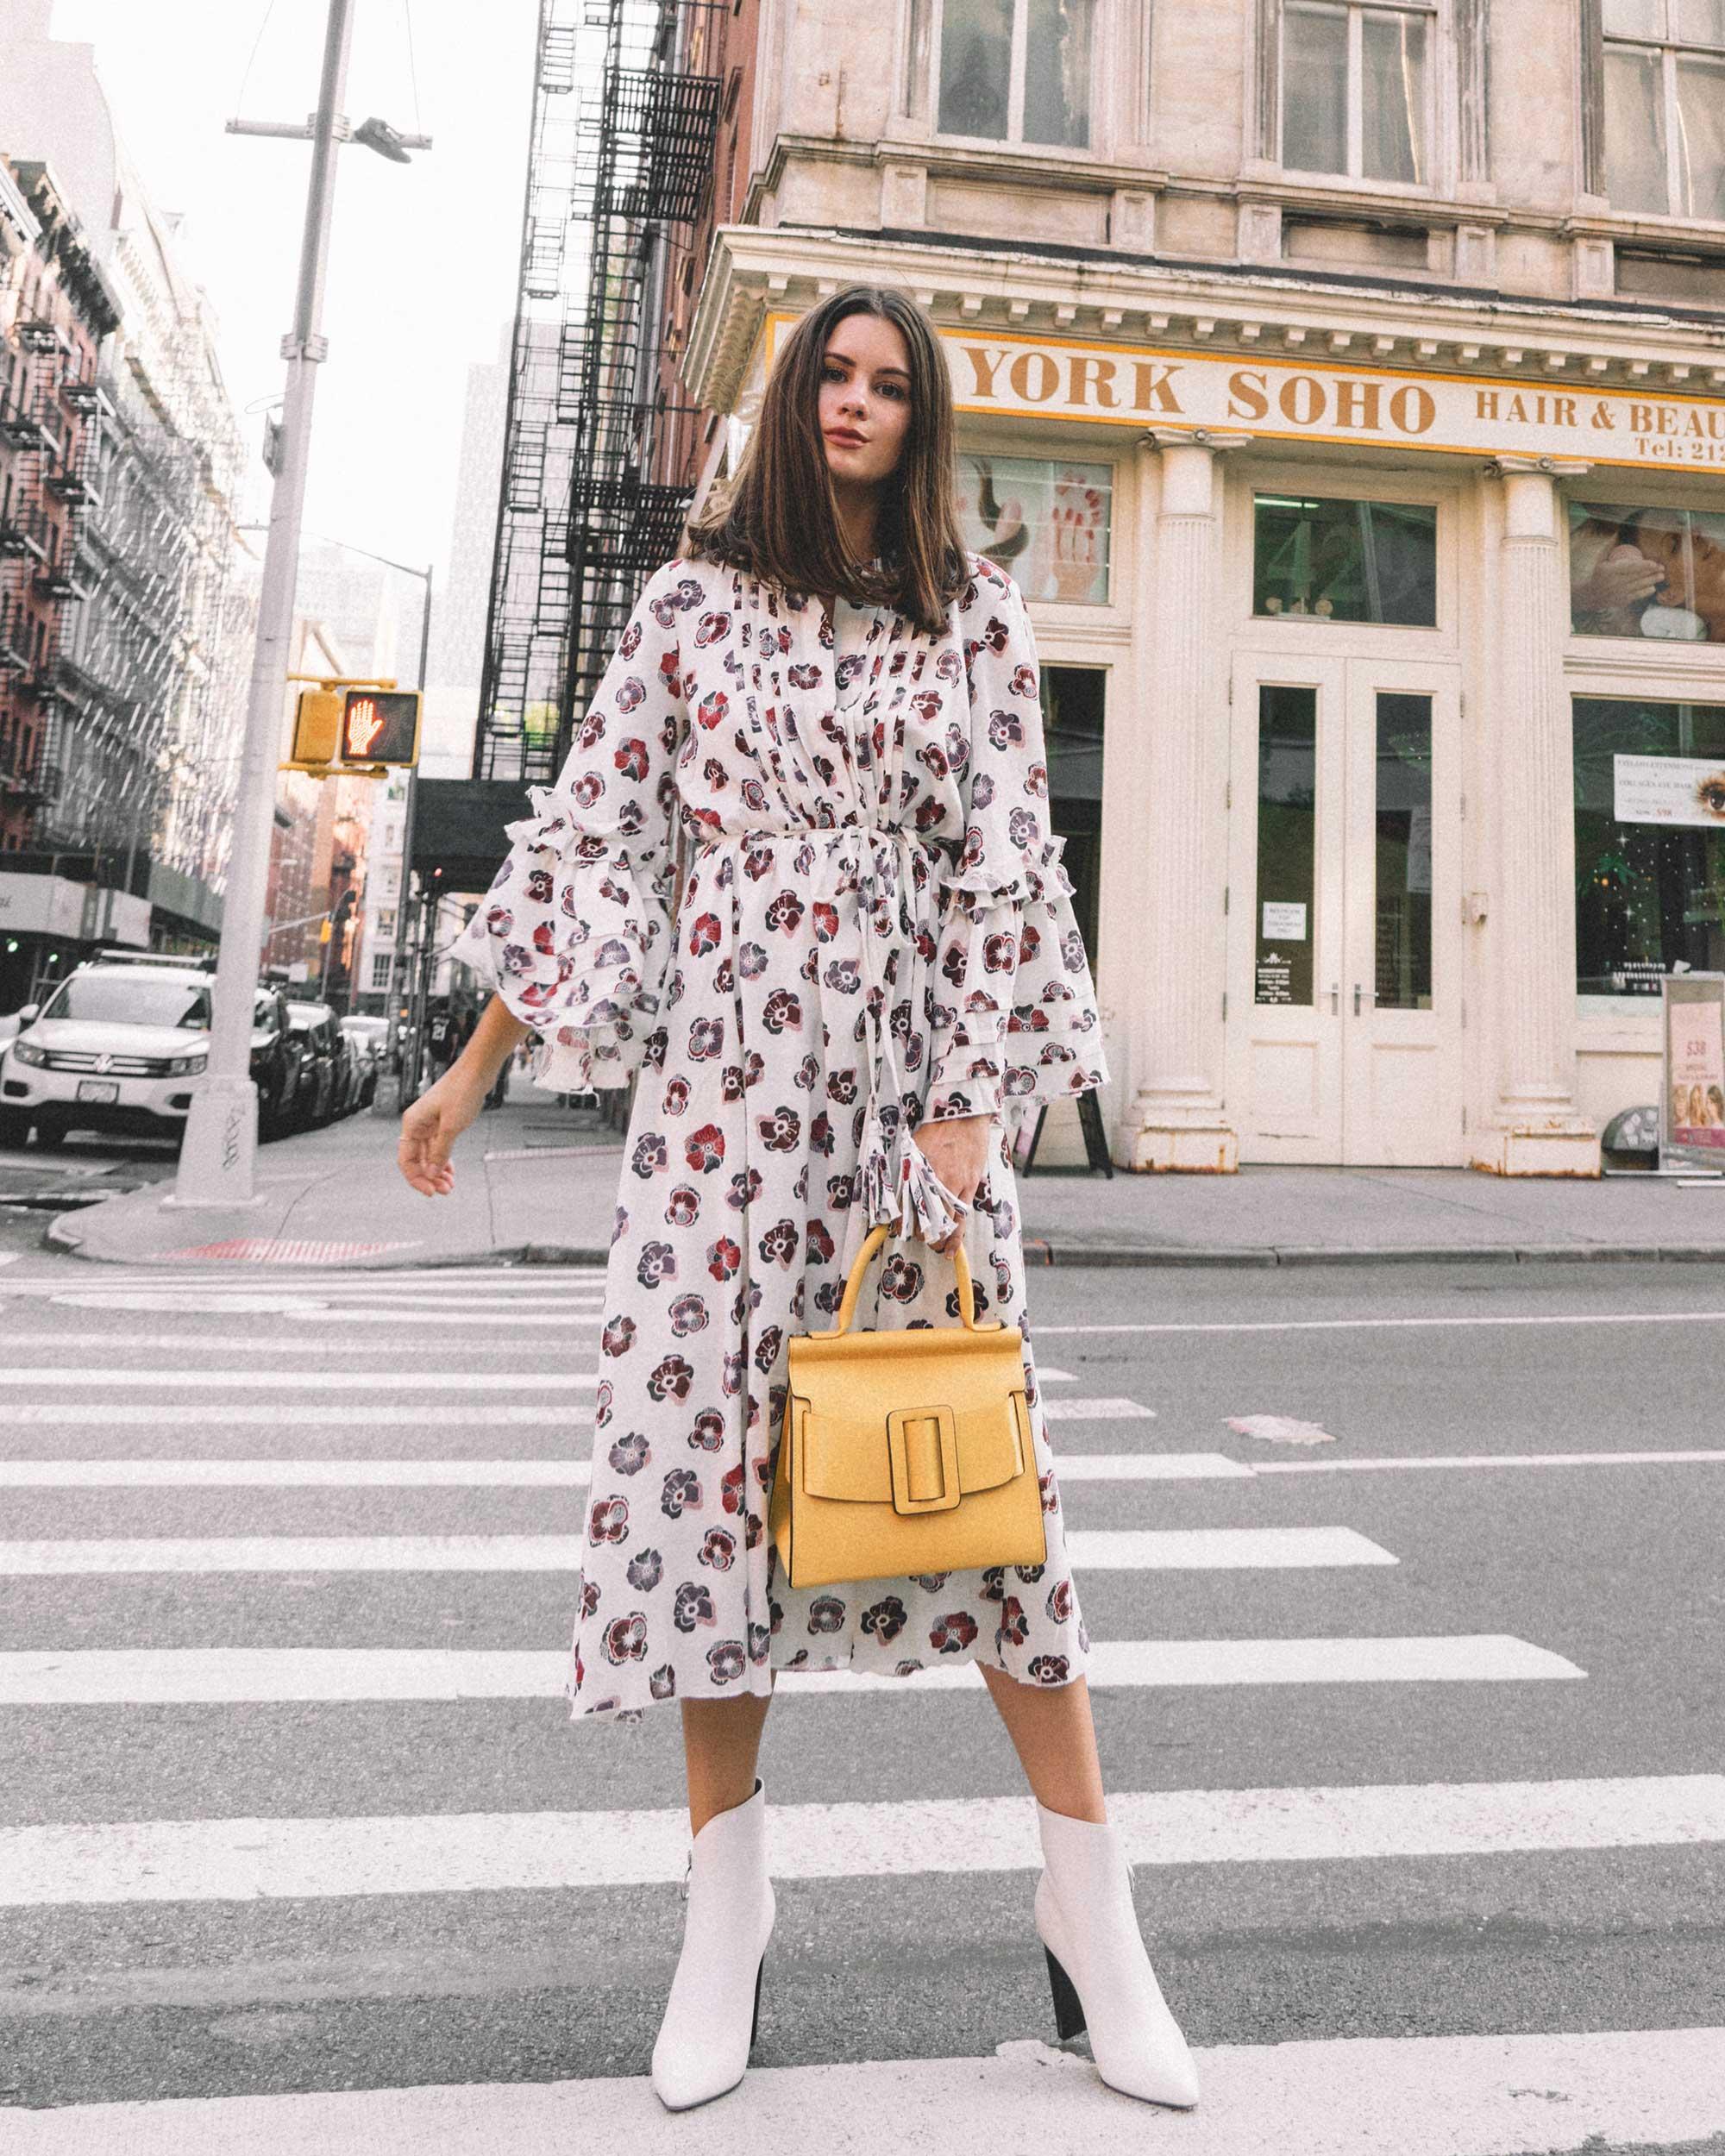 Madewell x Karen Walker Floral Fantasia Ruffled Dress and BOYY Karl 24 Bag soho new york fashion week outfit4.jpg